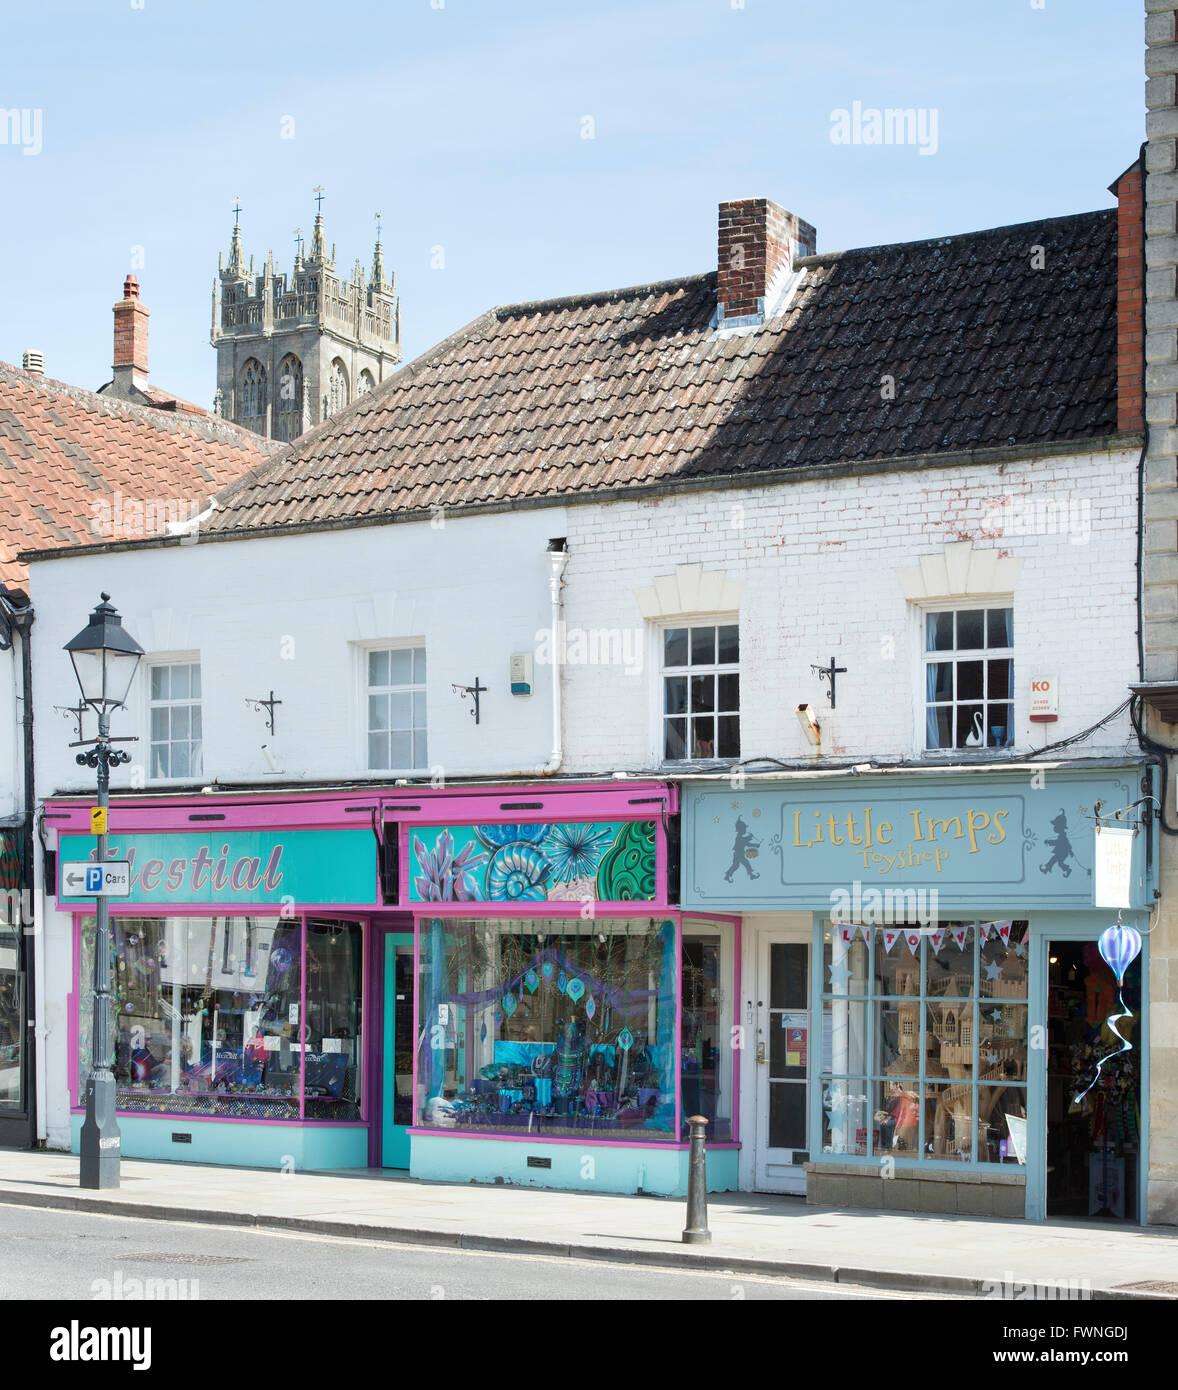 Colourful shop fronts, magdalene street. Glastonbury, Somerset, England - Stock Image